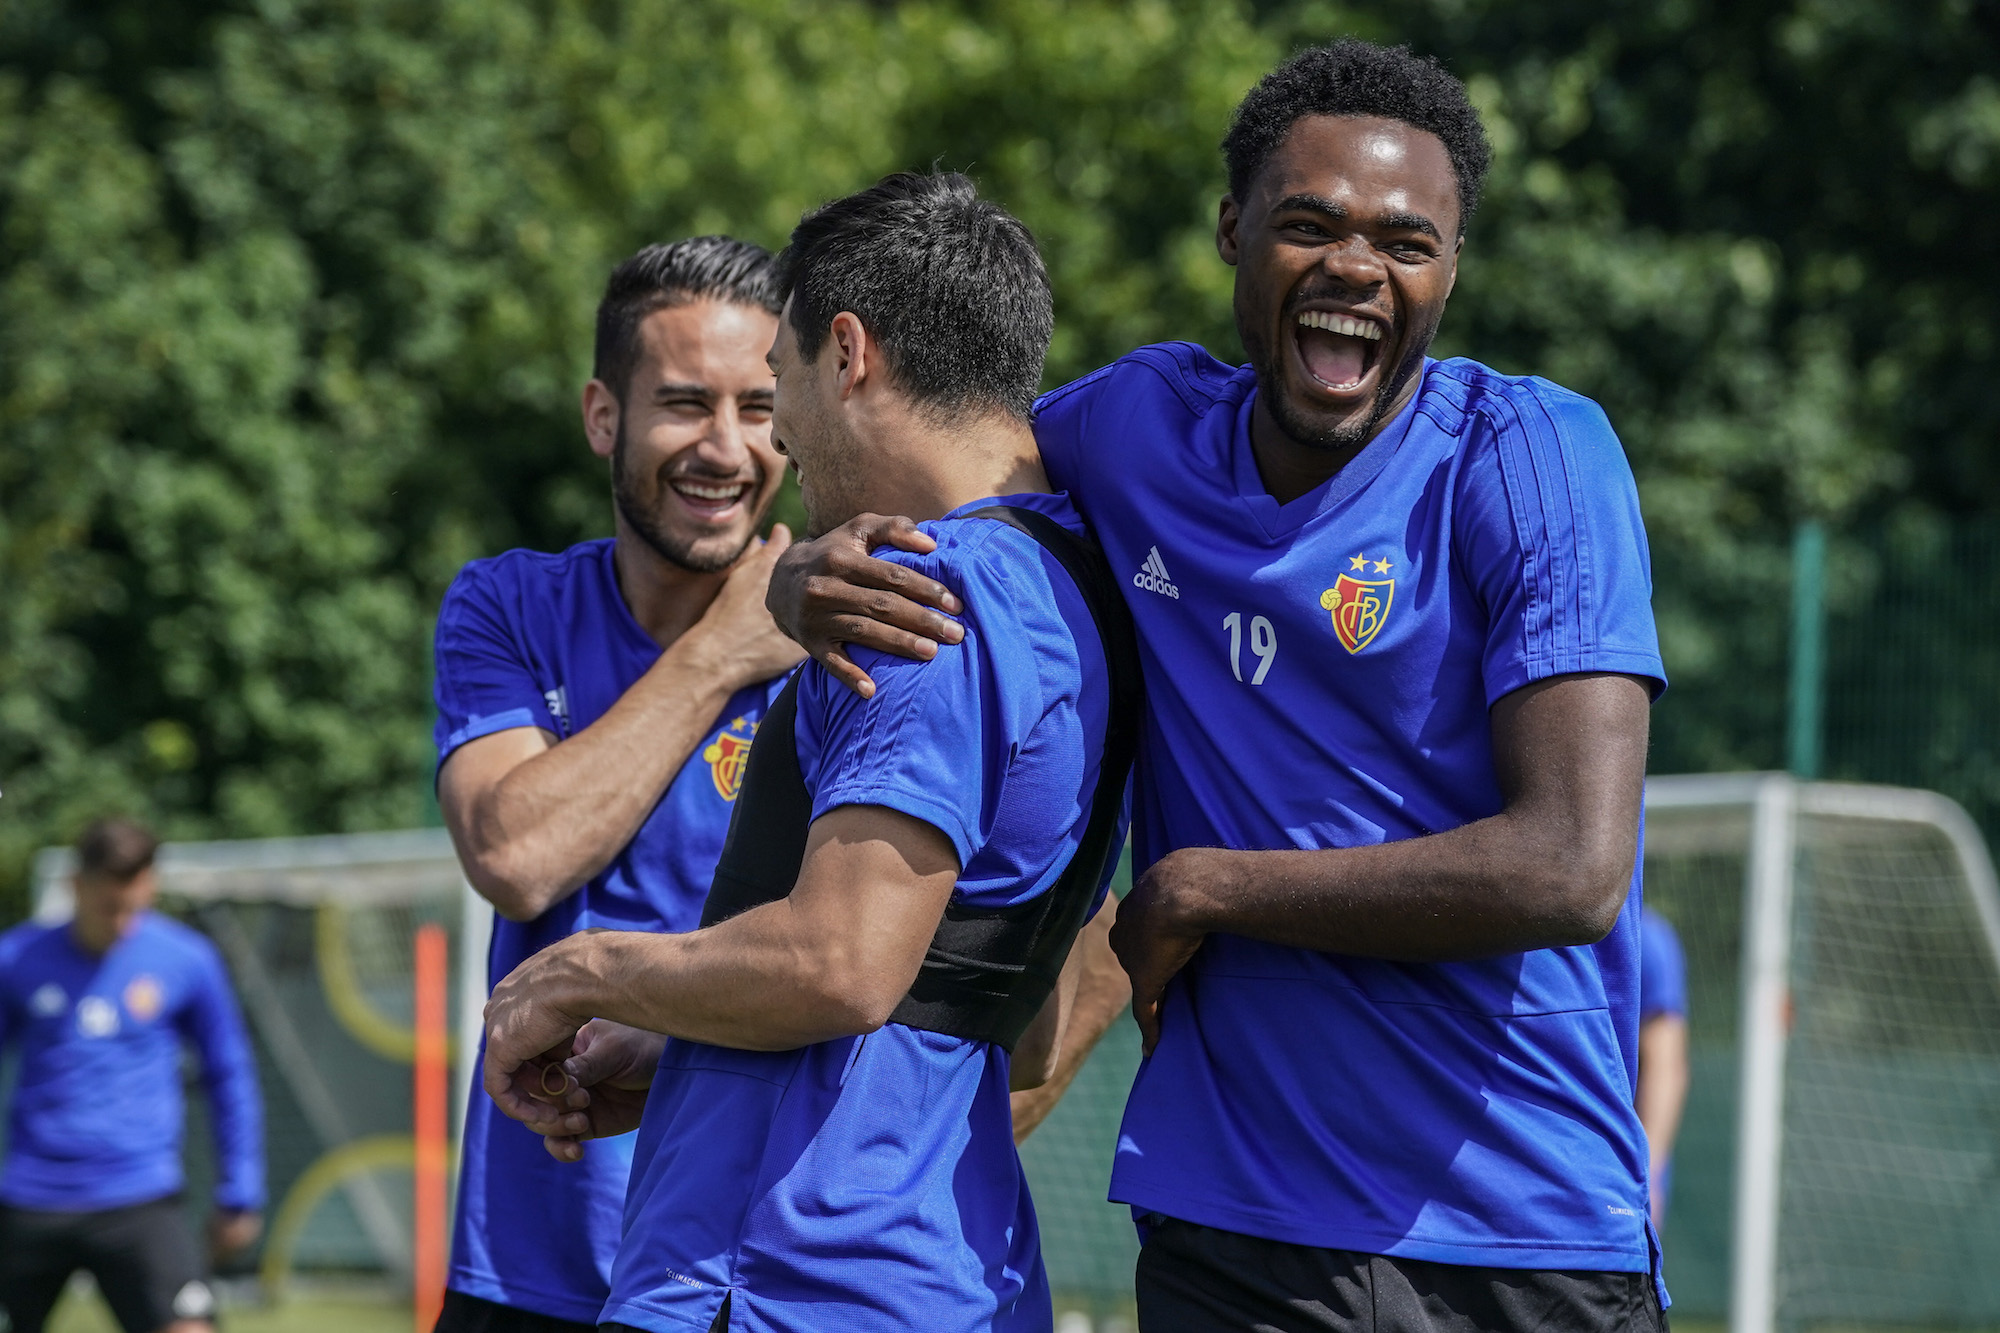 14.06.2018; Basel; Fussball Super League - Training FC Basel;Samuele Campo (Basel) Blas Riveros (Basel) Dimitri Oberlin (Bas